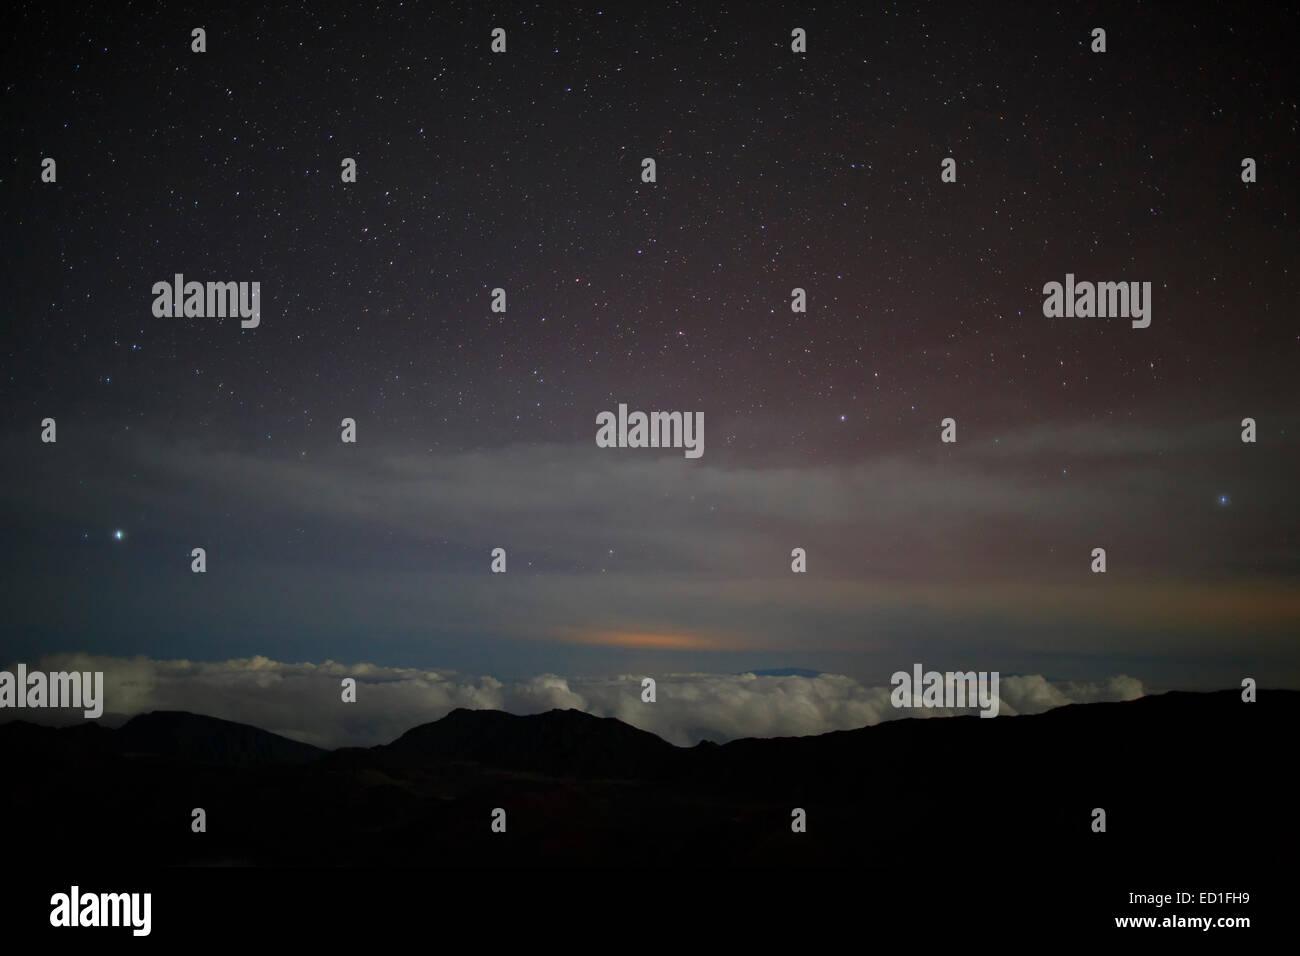 Stars from near the top of Haleakala, Haleakala National Park, Maui, Hawaii. - Stock Image